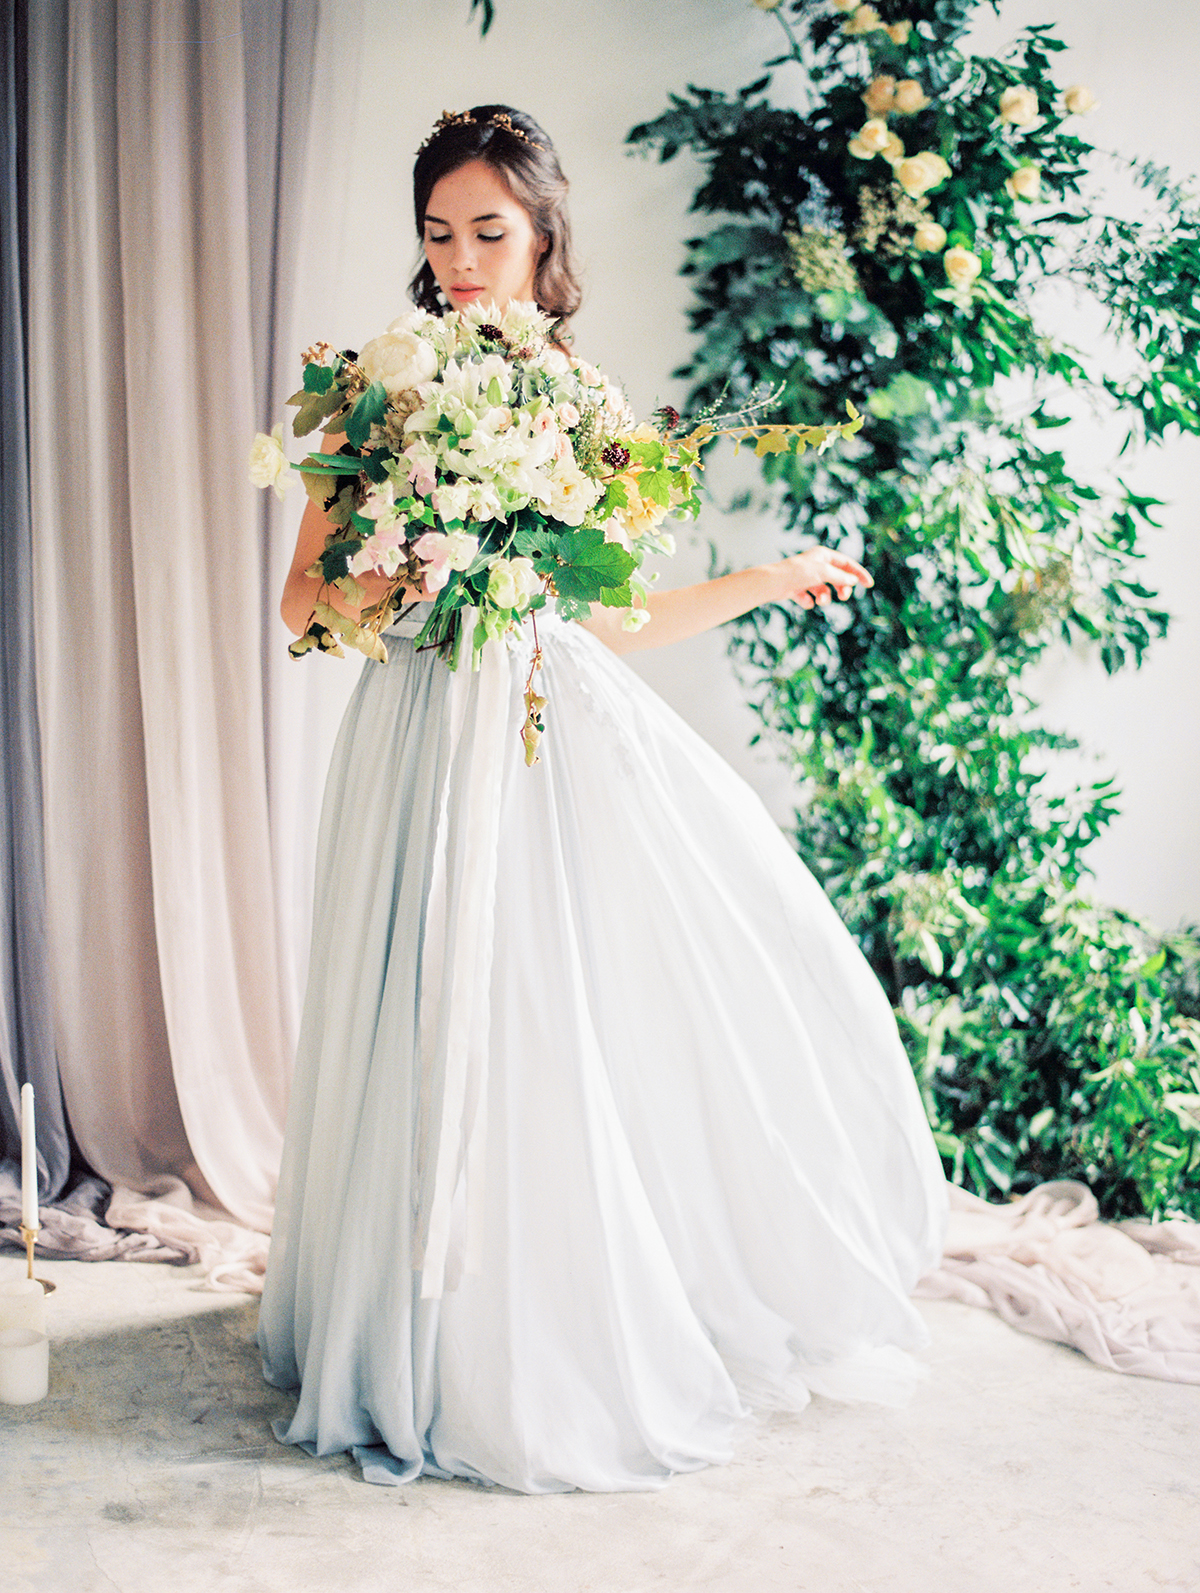 Pale Blue Wedding Dress - Elizabeth Anne Designs: The Wedding Blog